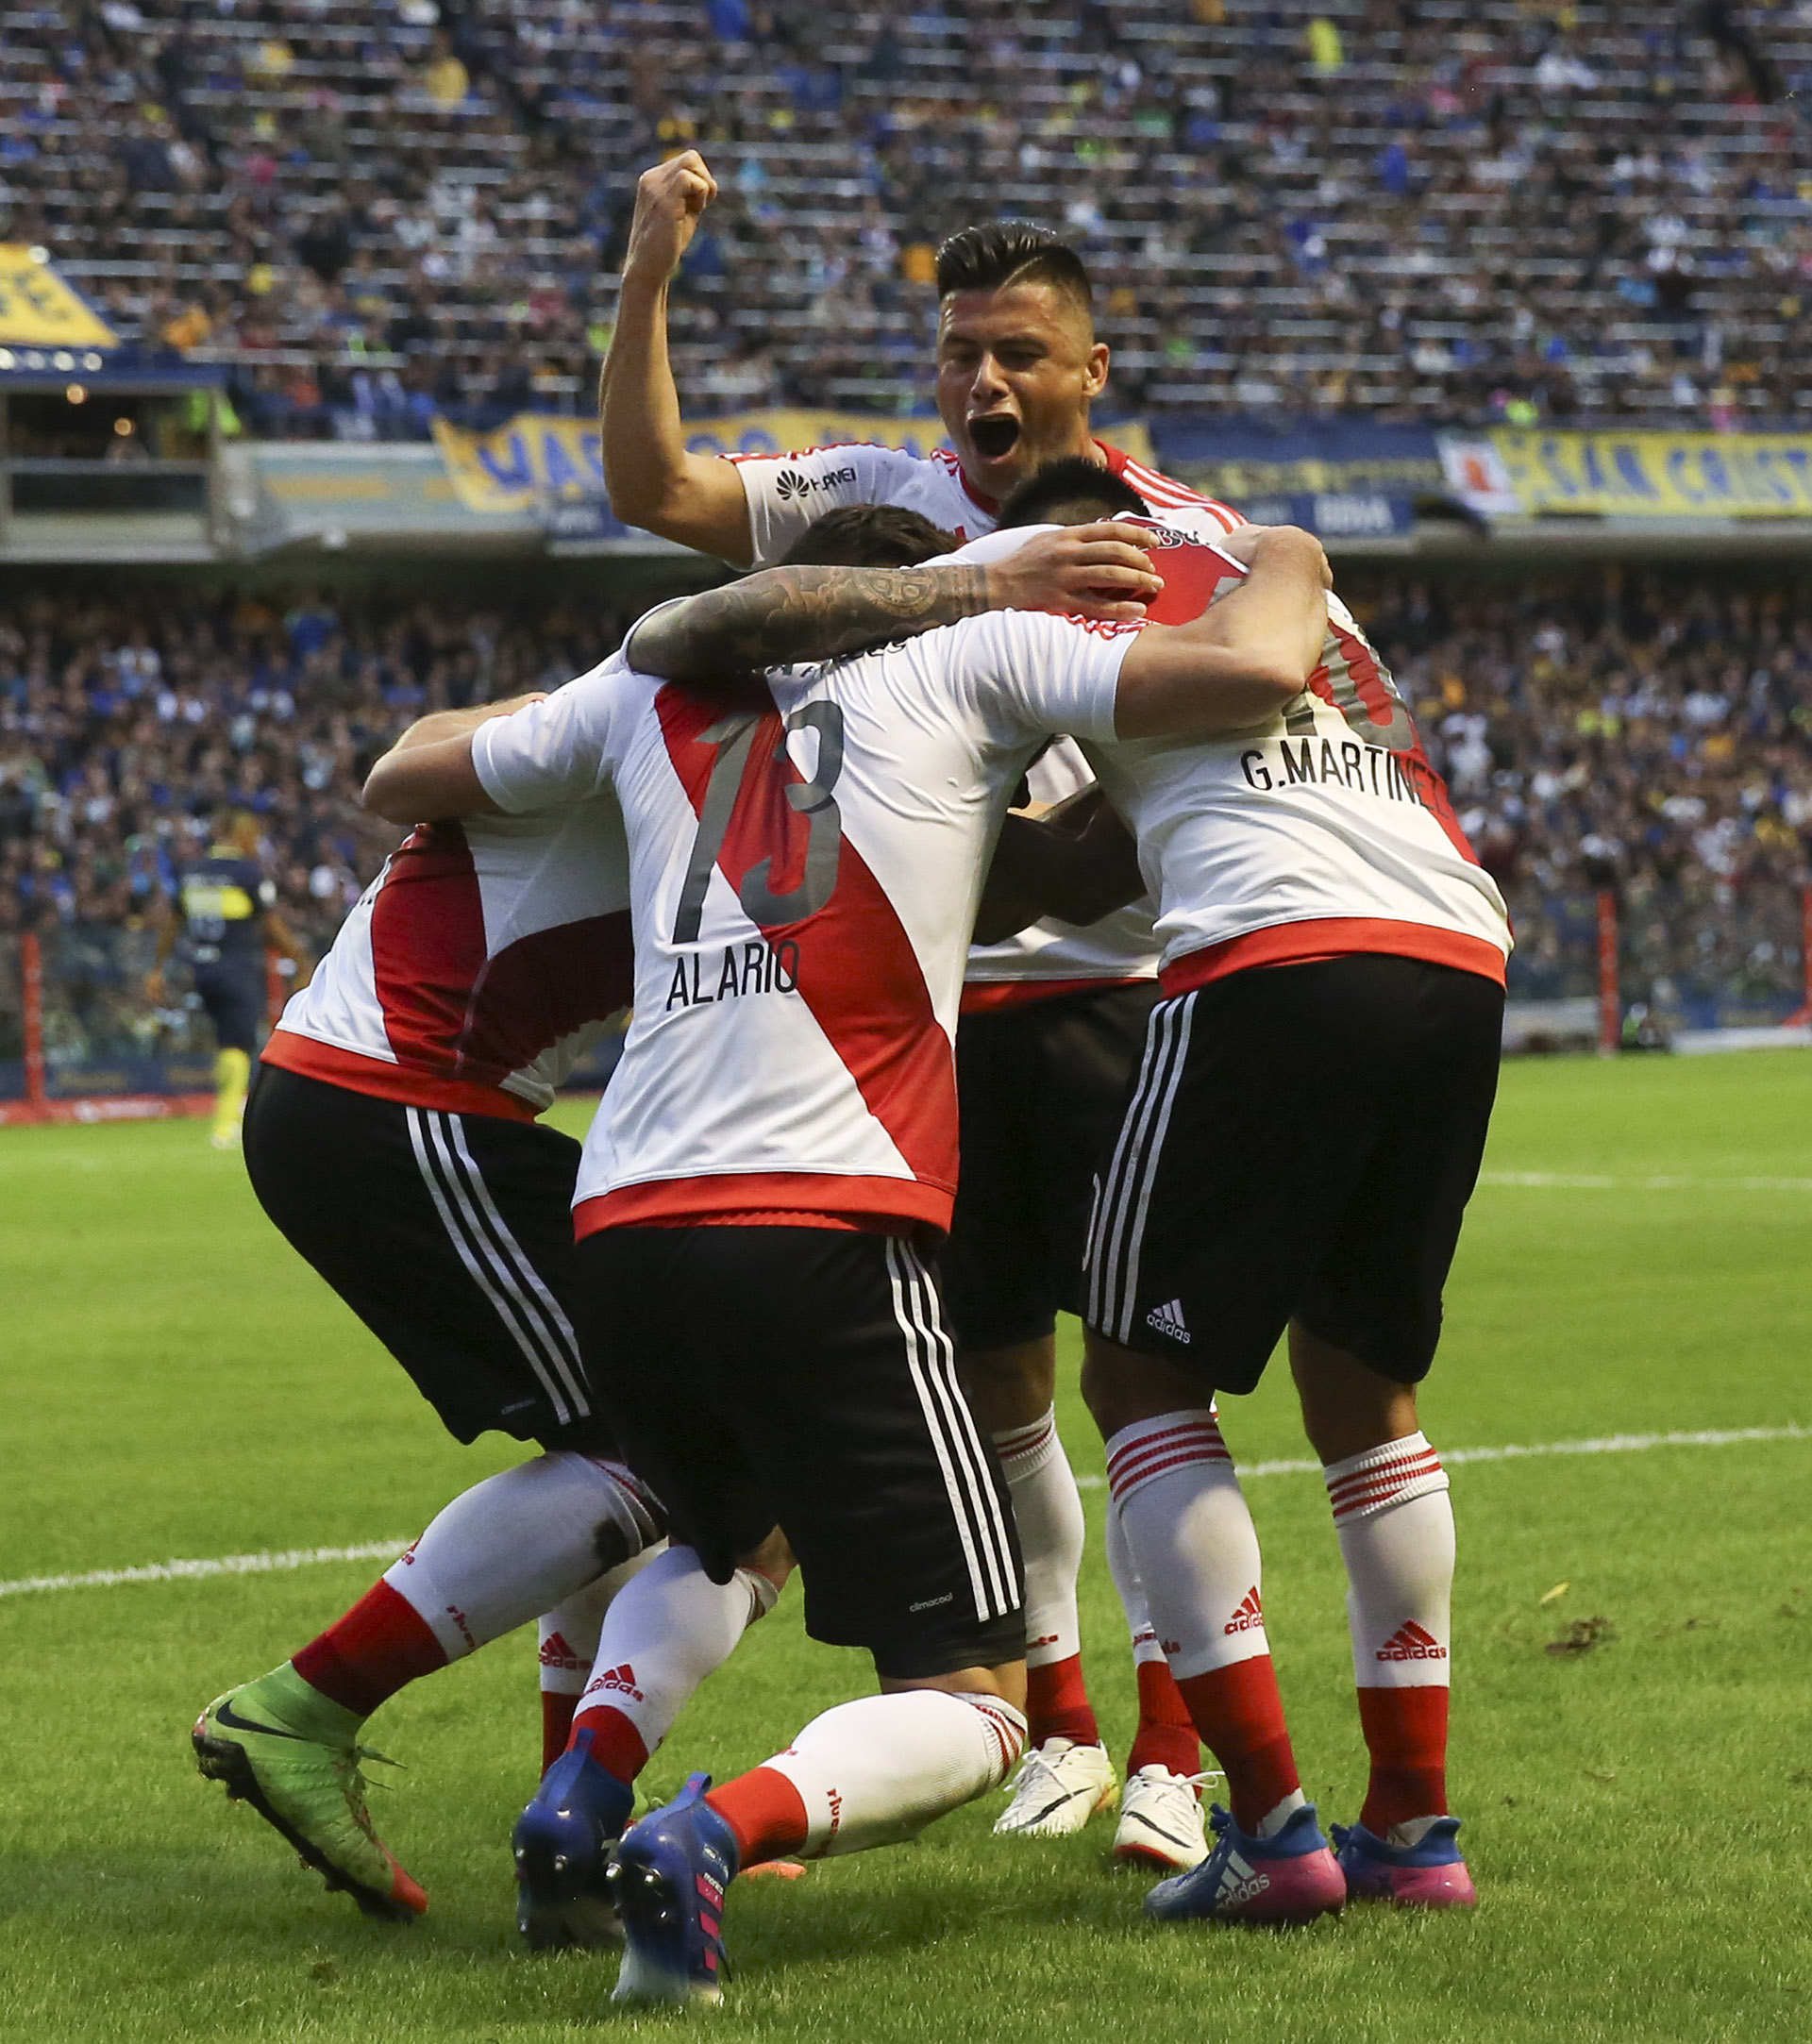 Fin del partido: River se impuso sobre Boca por un contundente 3-1